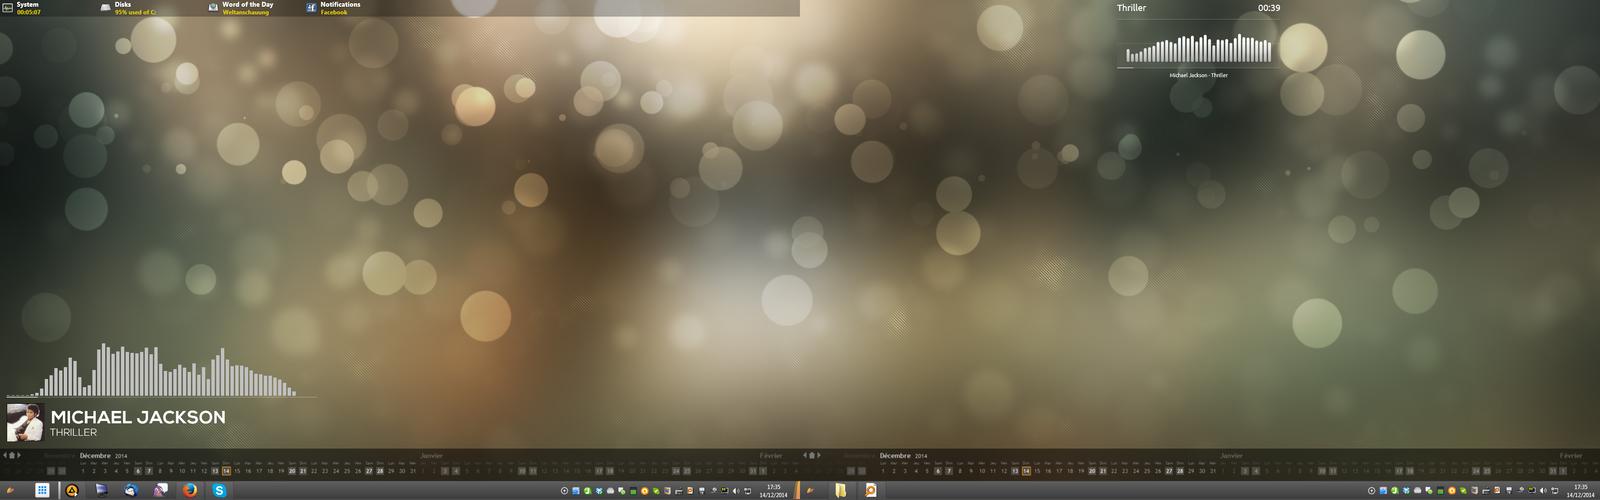 Desktop - 2014-12-14 by Erkhyan